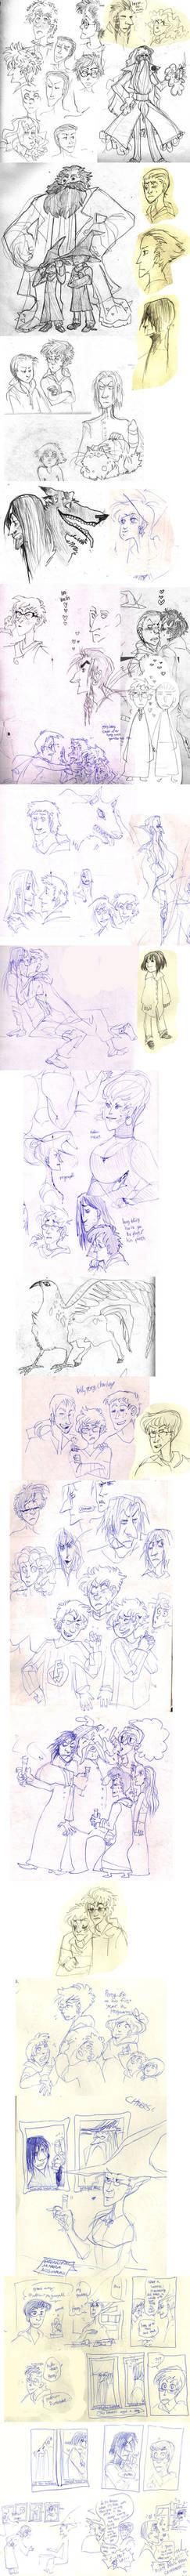 harry potter sketchdump